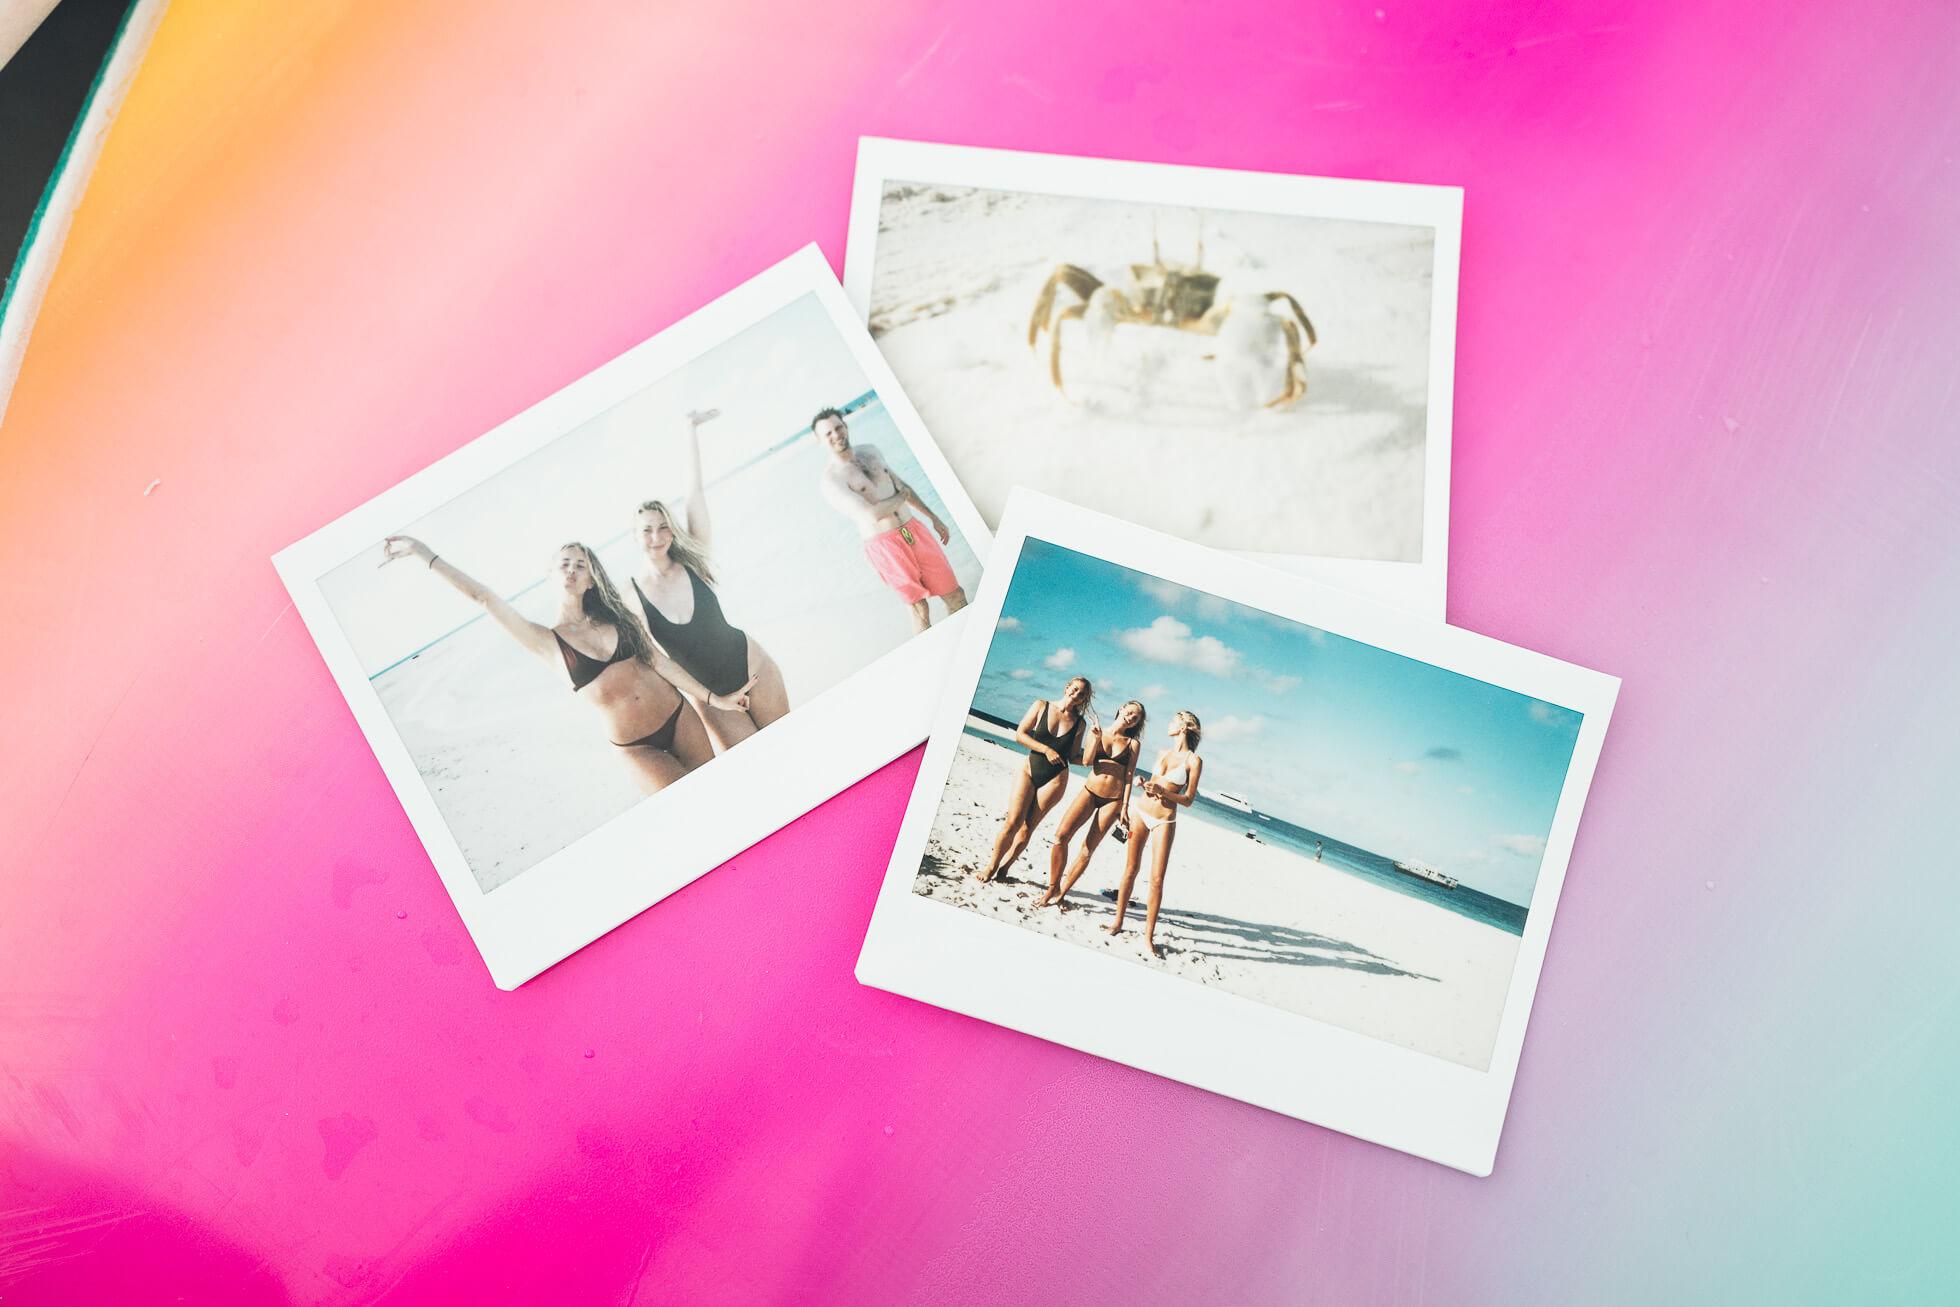 janni-deler-polaroids-maldivesl1150139